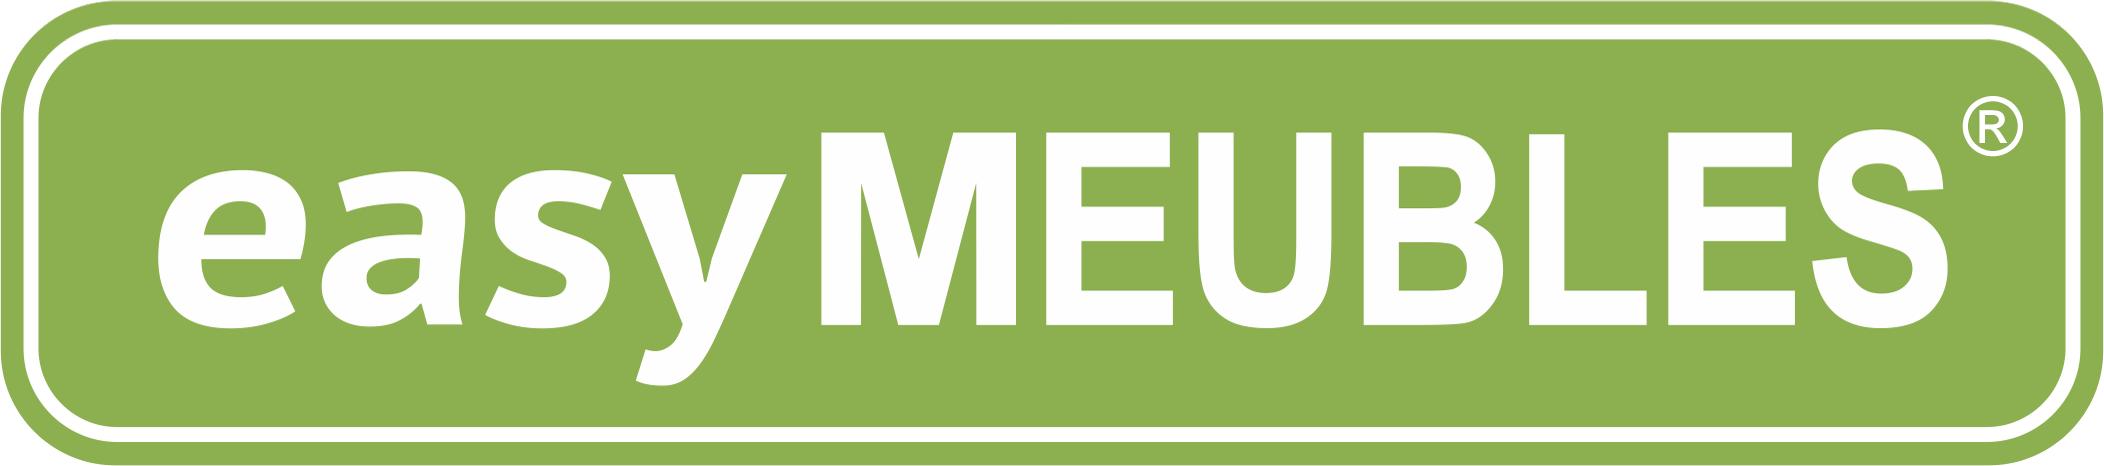 Commode bois de pin massif naturel 043 – Dimensions: 100 x 118 x 47 cm (H x L x P)